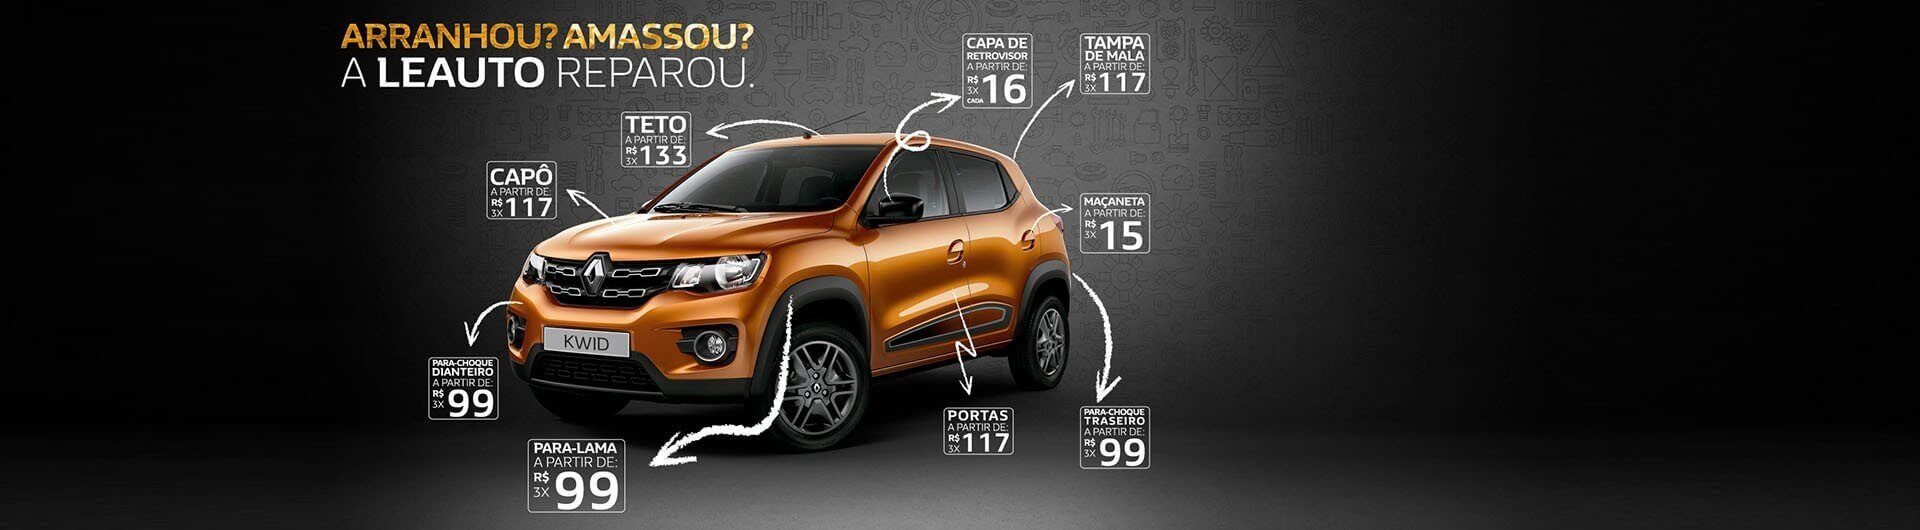 Sempre Novo Renault